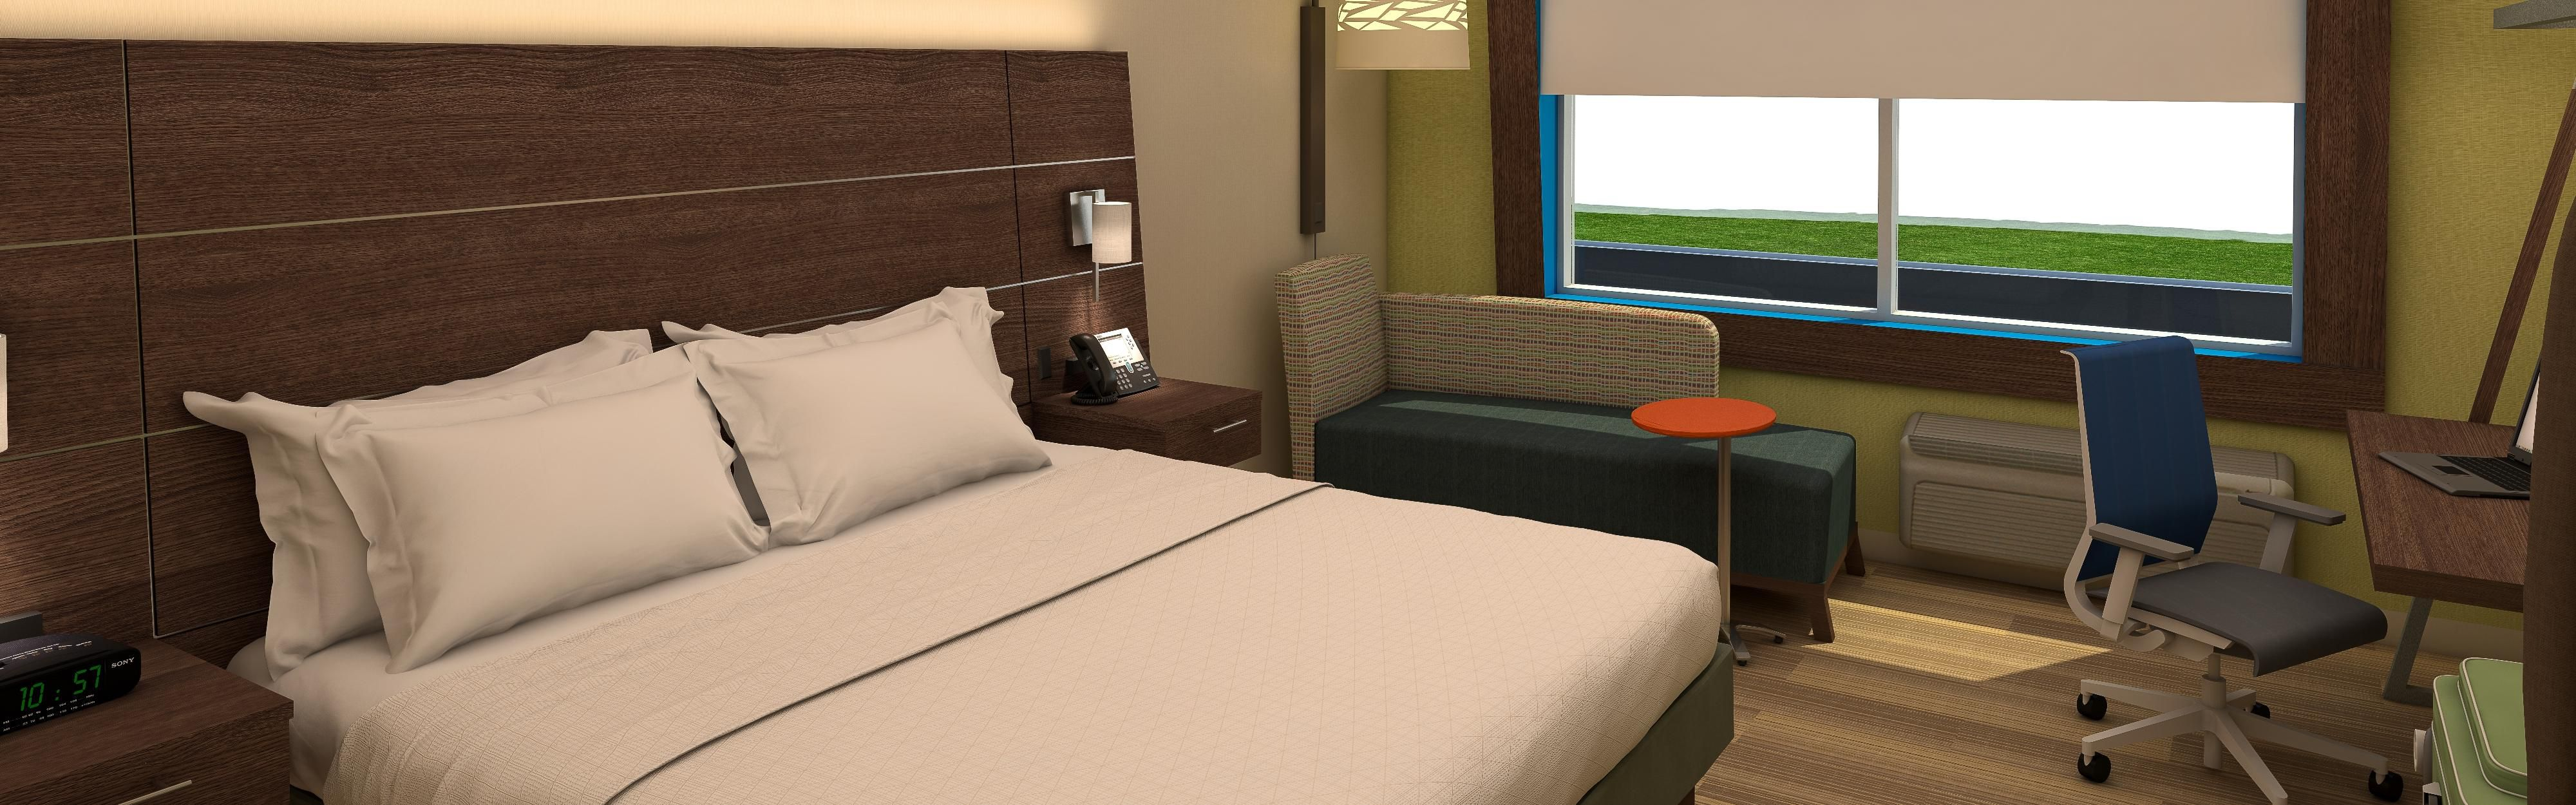 Holiday Inn Express Spring Hill image 1